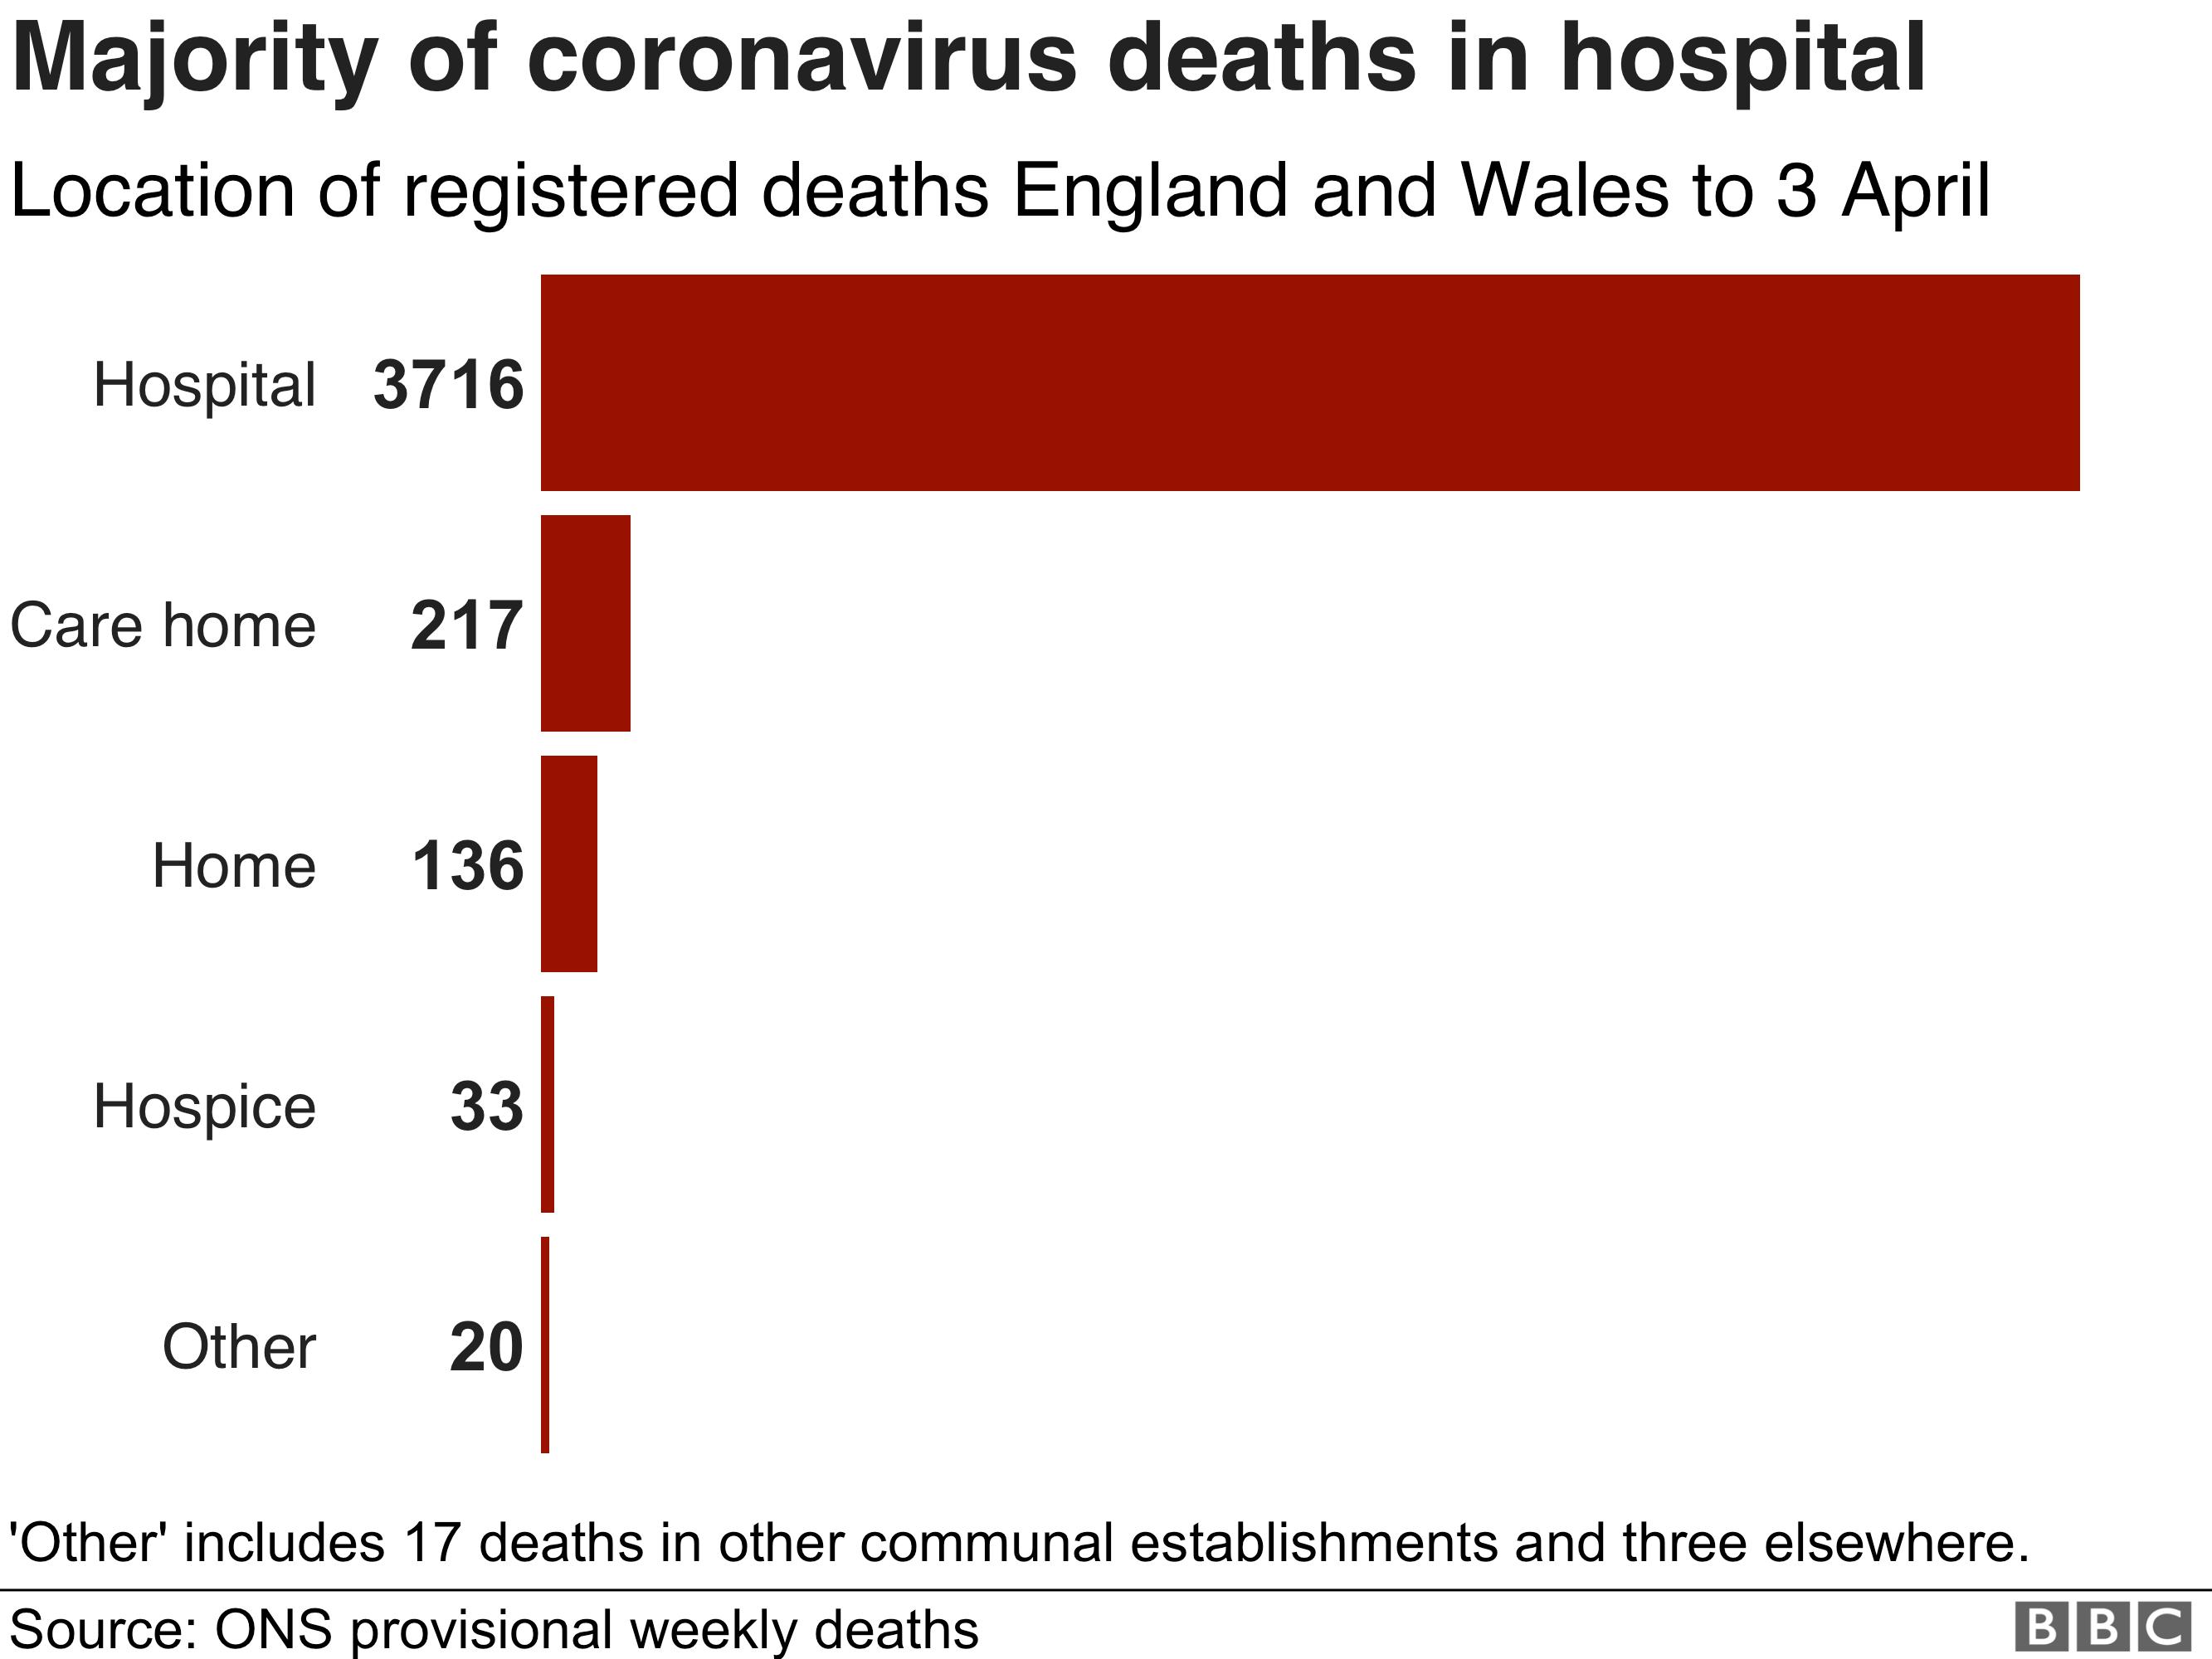 Location of coronavirus deaths